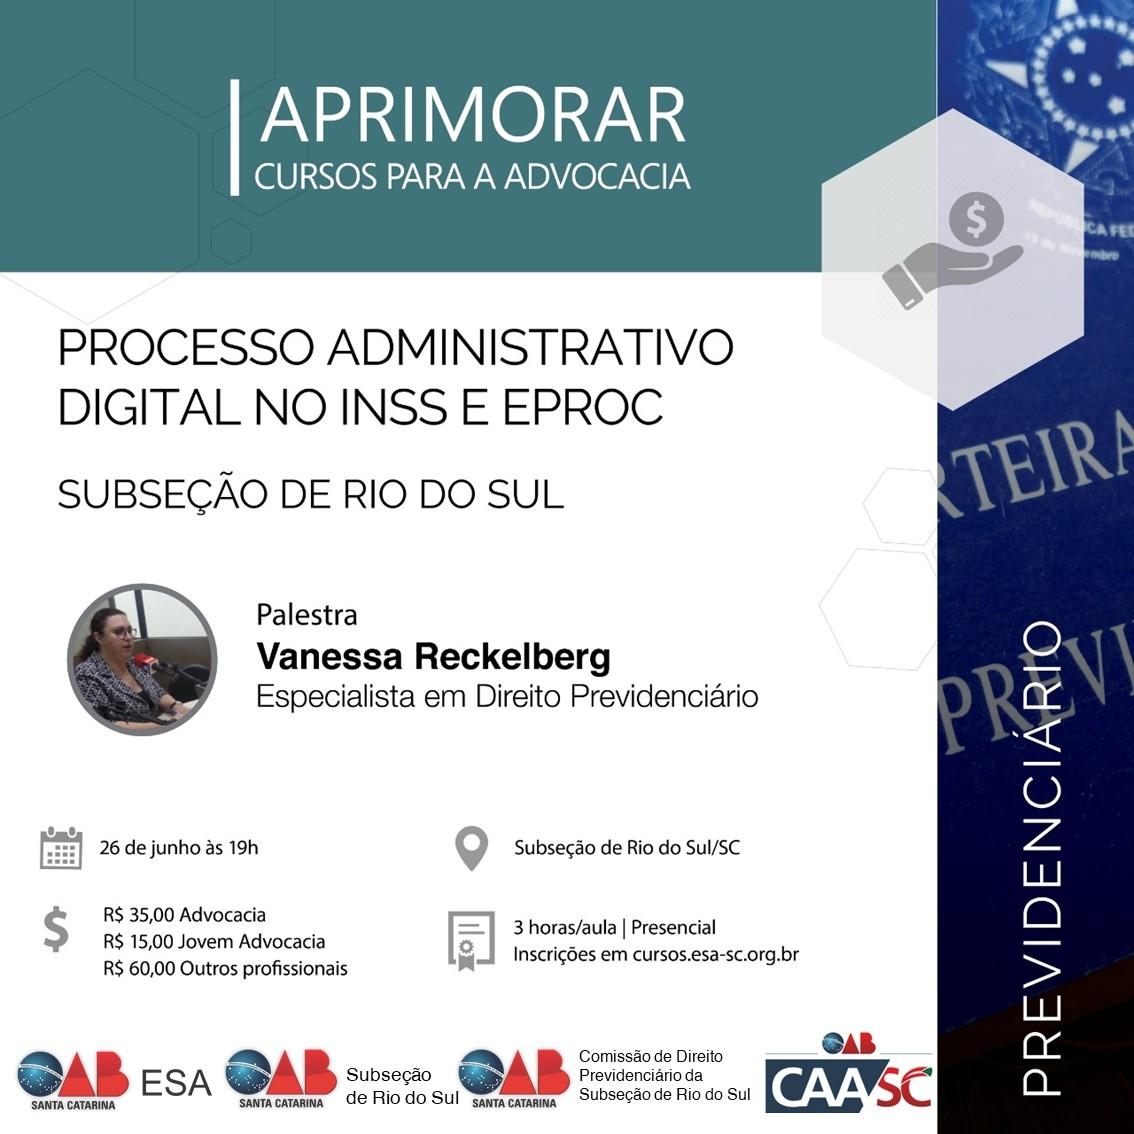 Processo Administrativo no INSS e Eproc - Rio do Sul.jpg